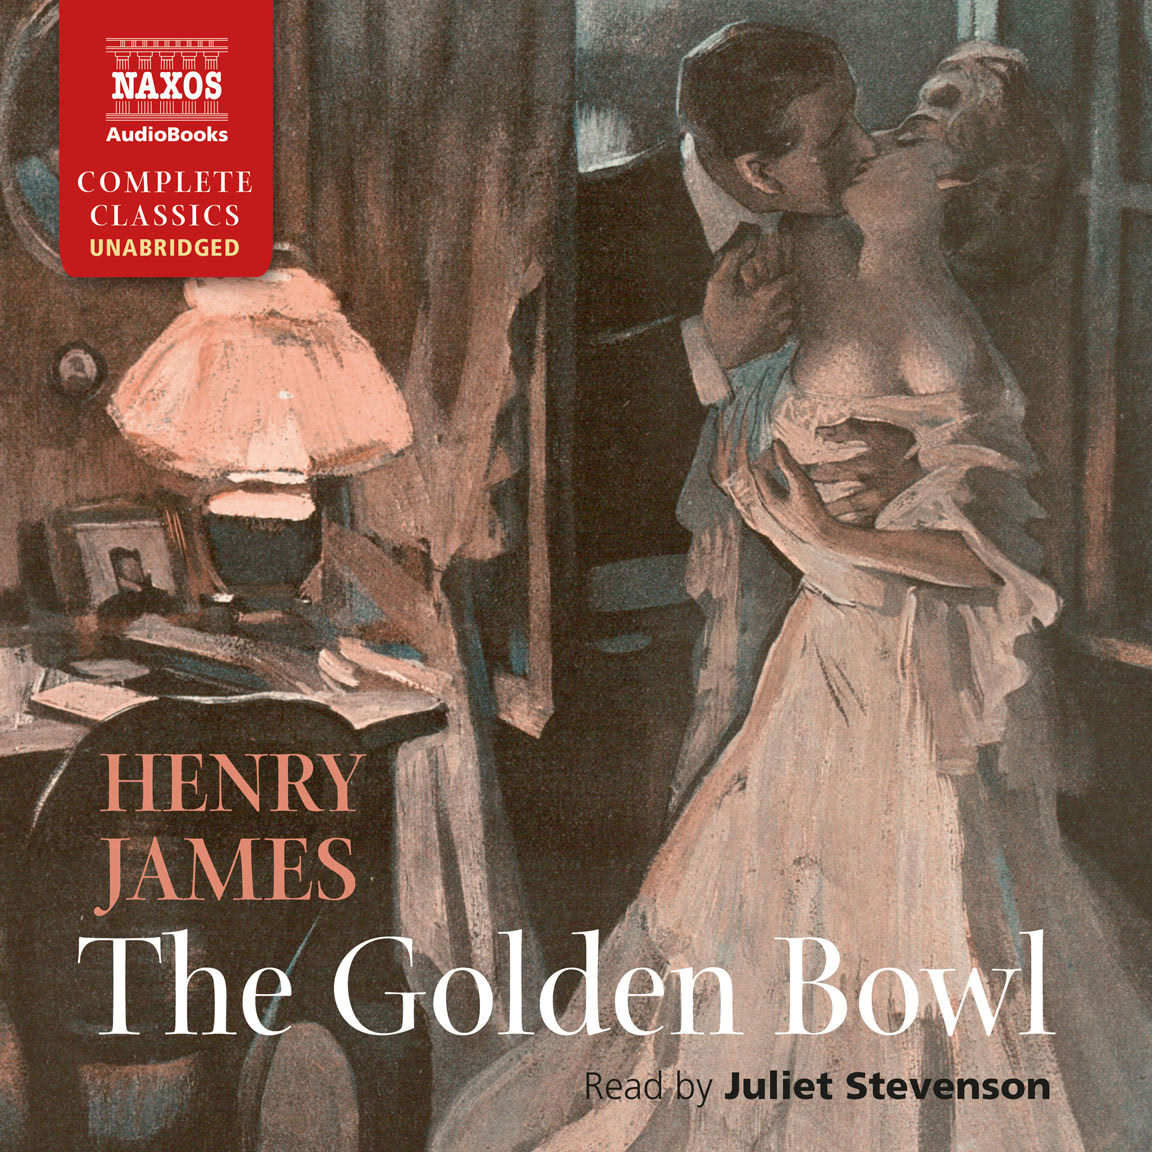 The Golden Bowl (unabridged)